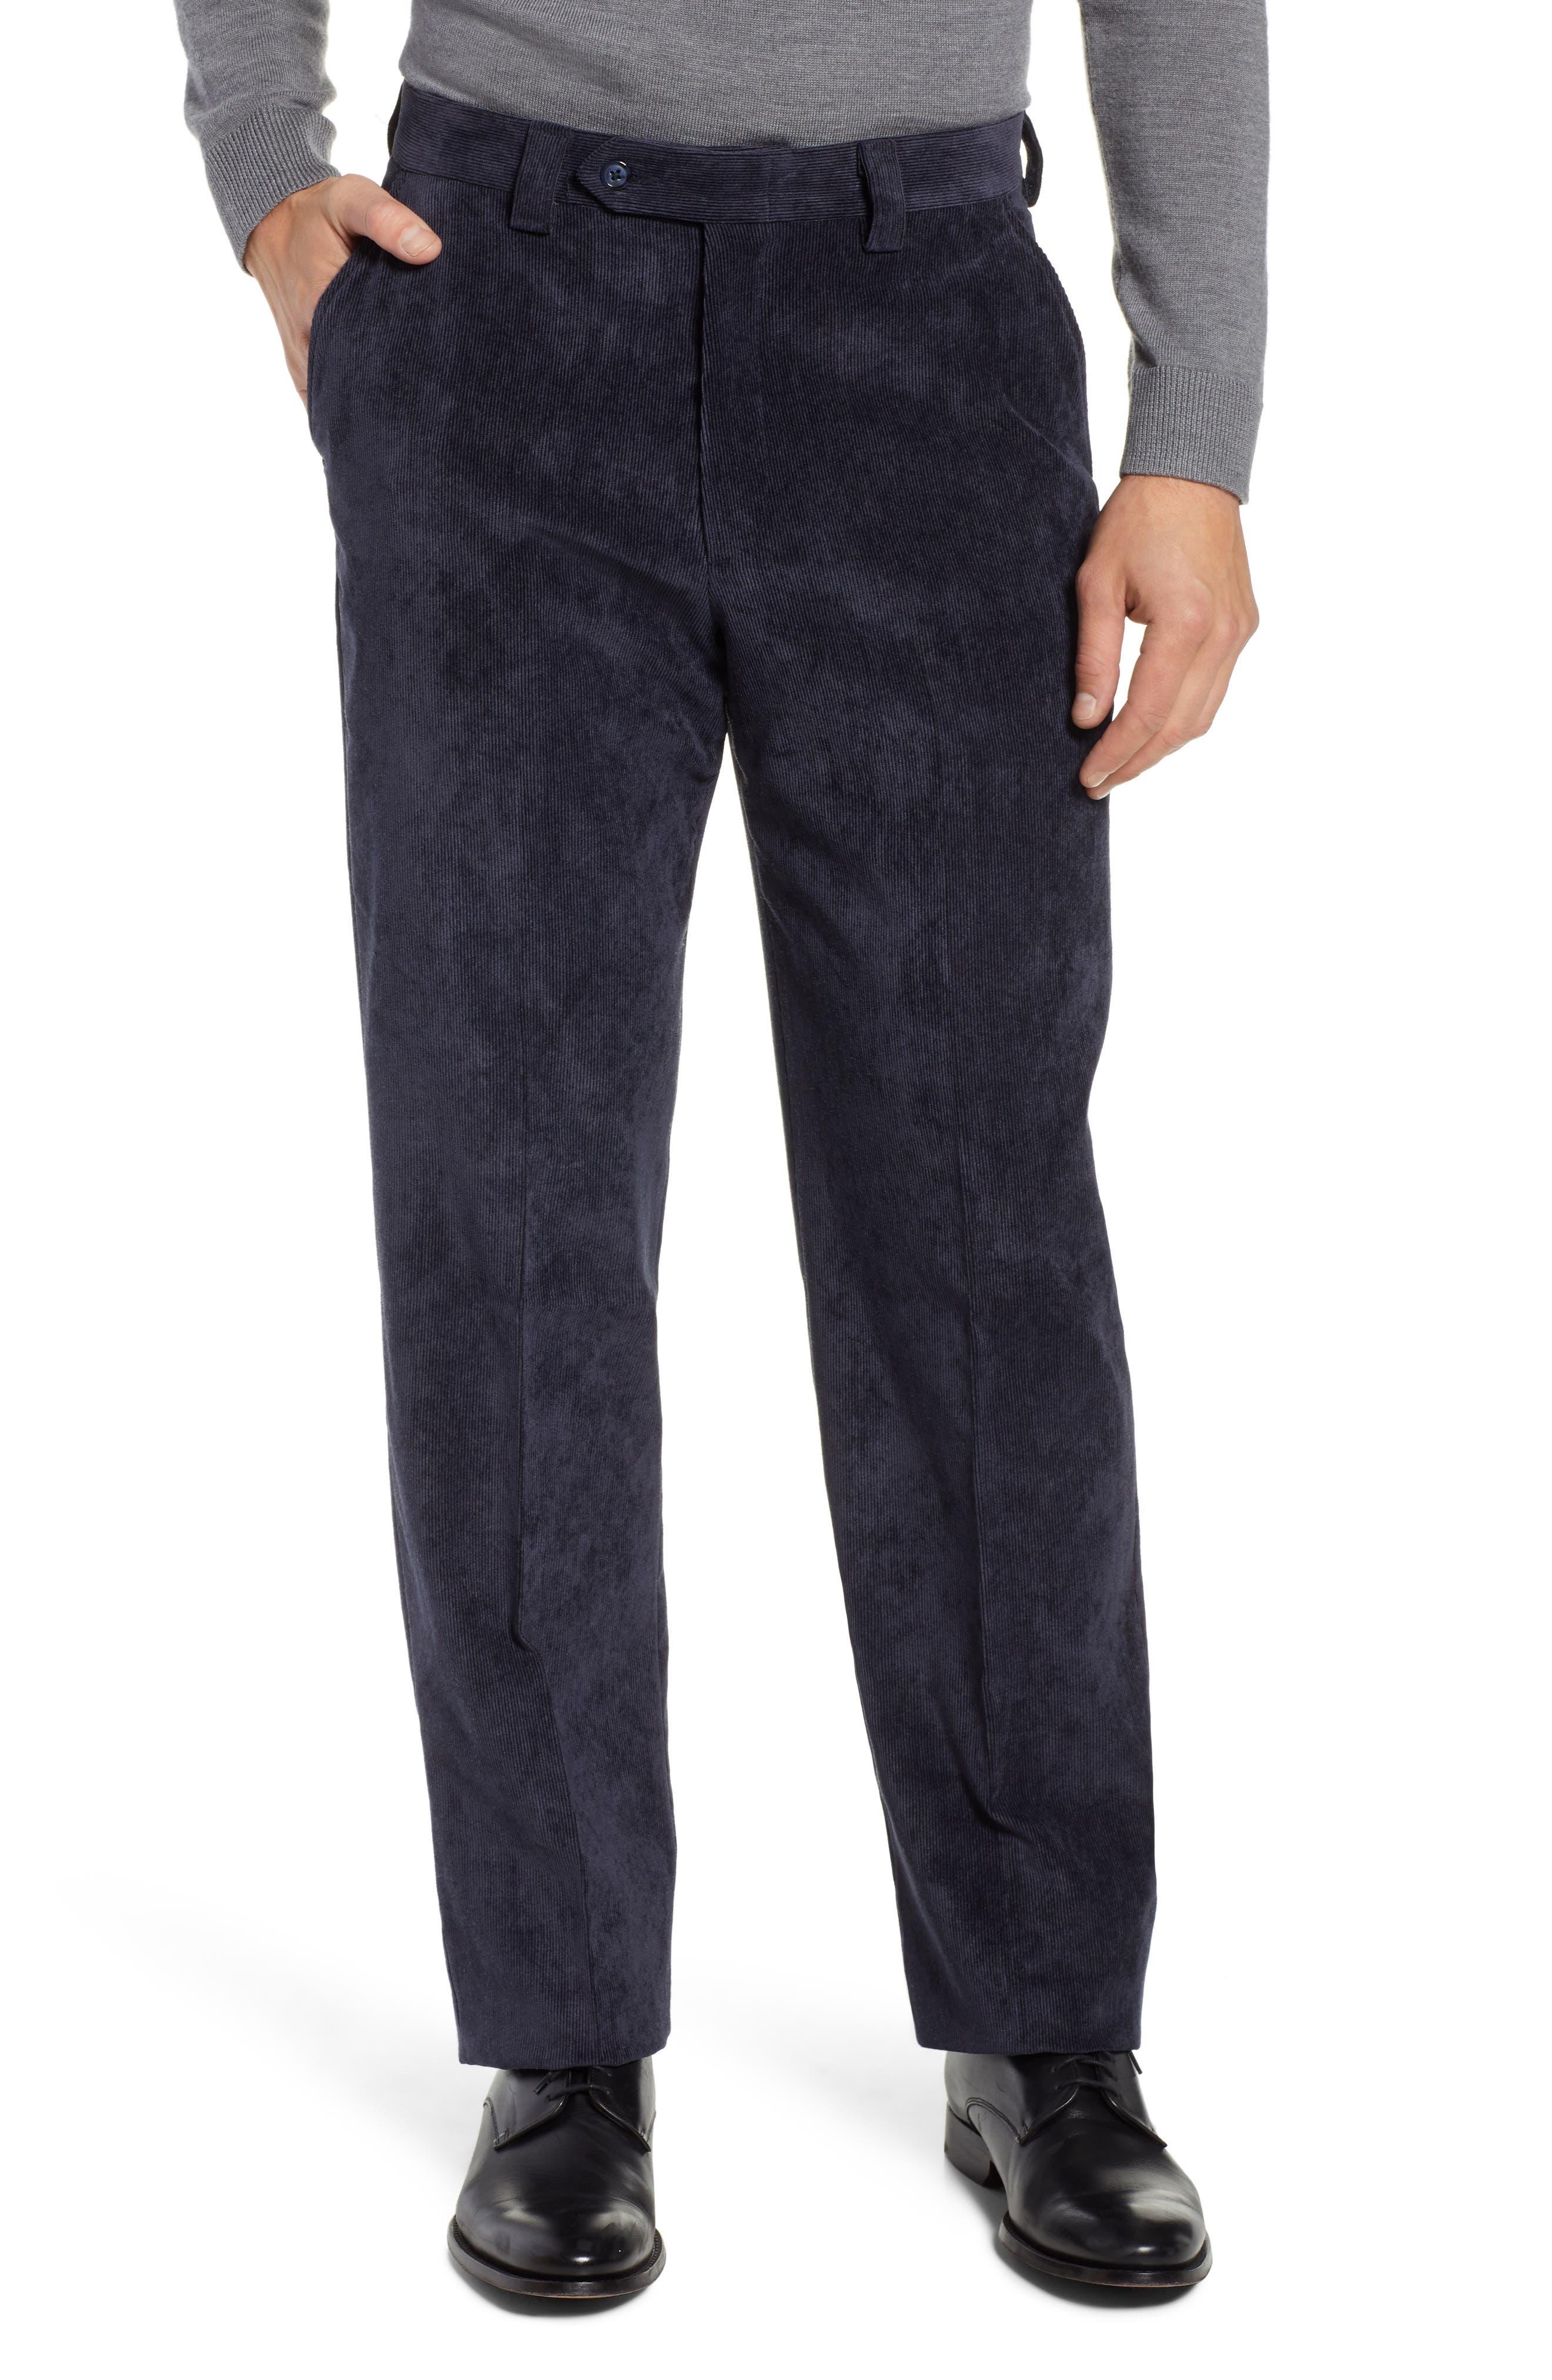 Men's Vintage Pants, Trousers, Jeans, Overalls Mens Berle Classic Fit Flat Front Corduroy Trousers $64.99 AT vintagedancer.com